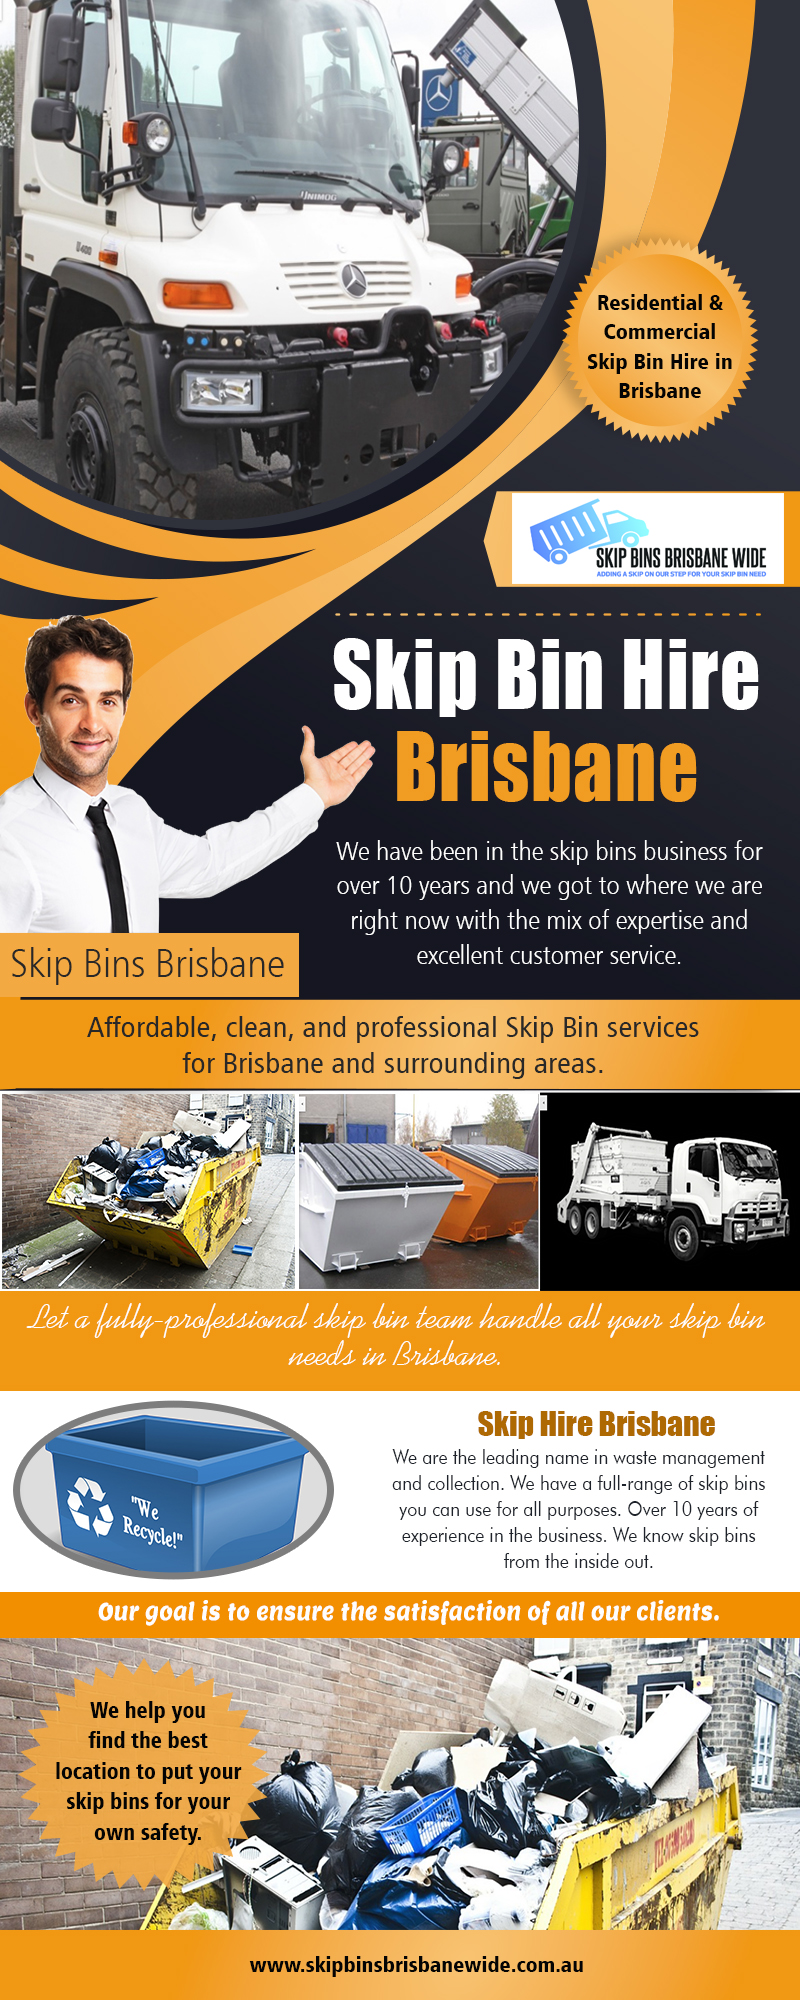 Skip Bin Hire in Brisbane | Call : 0721021262 | skipbinsbrisbanewide.com.au